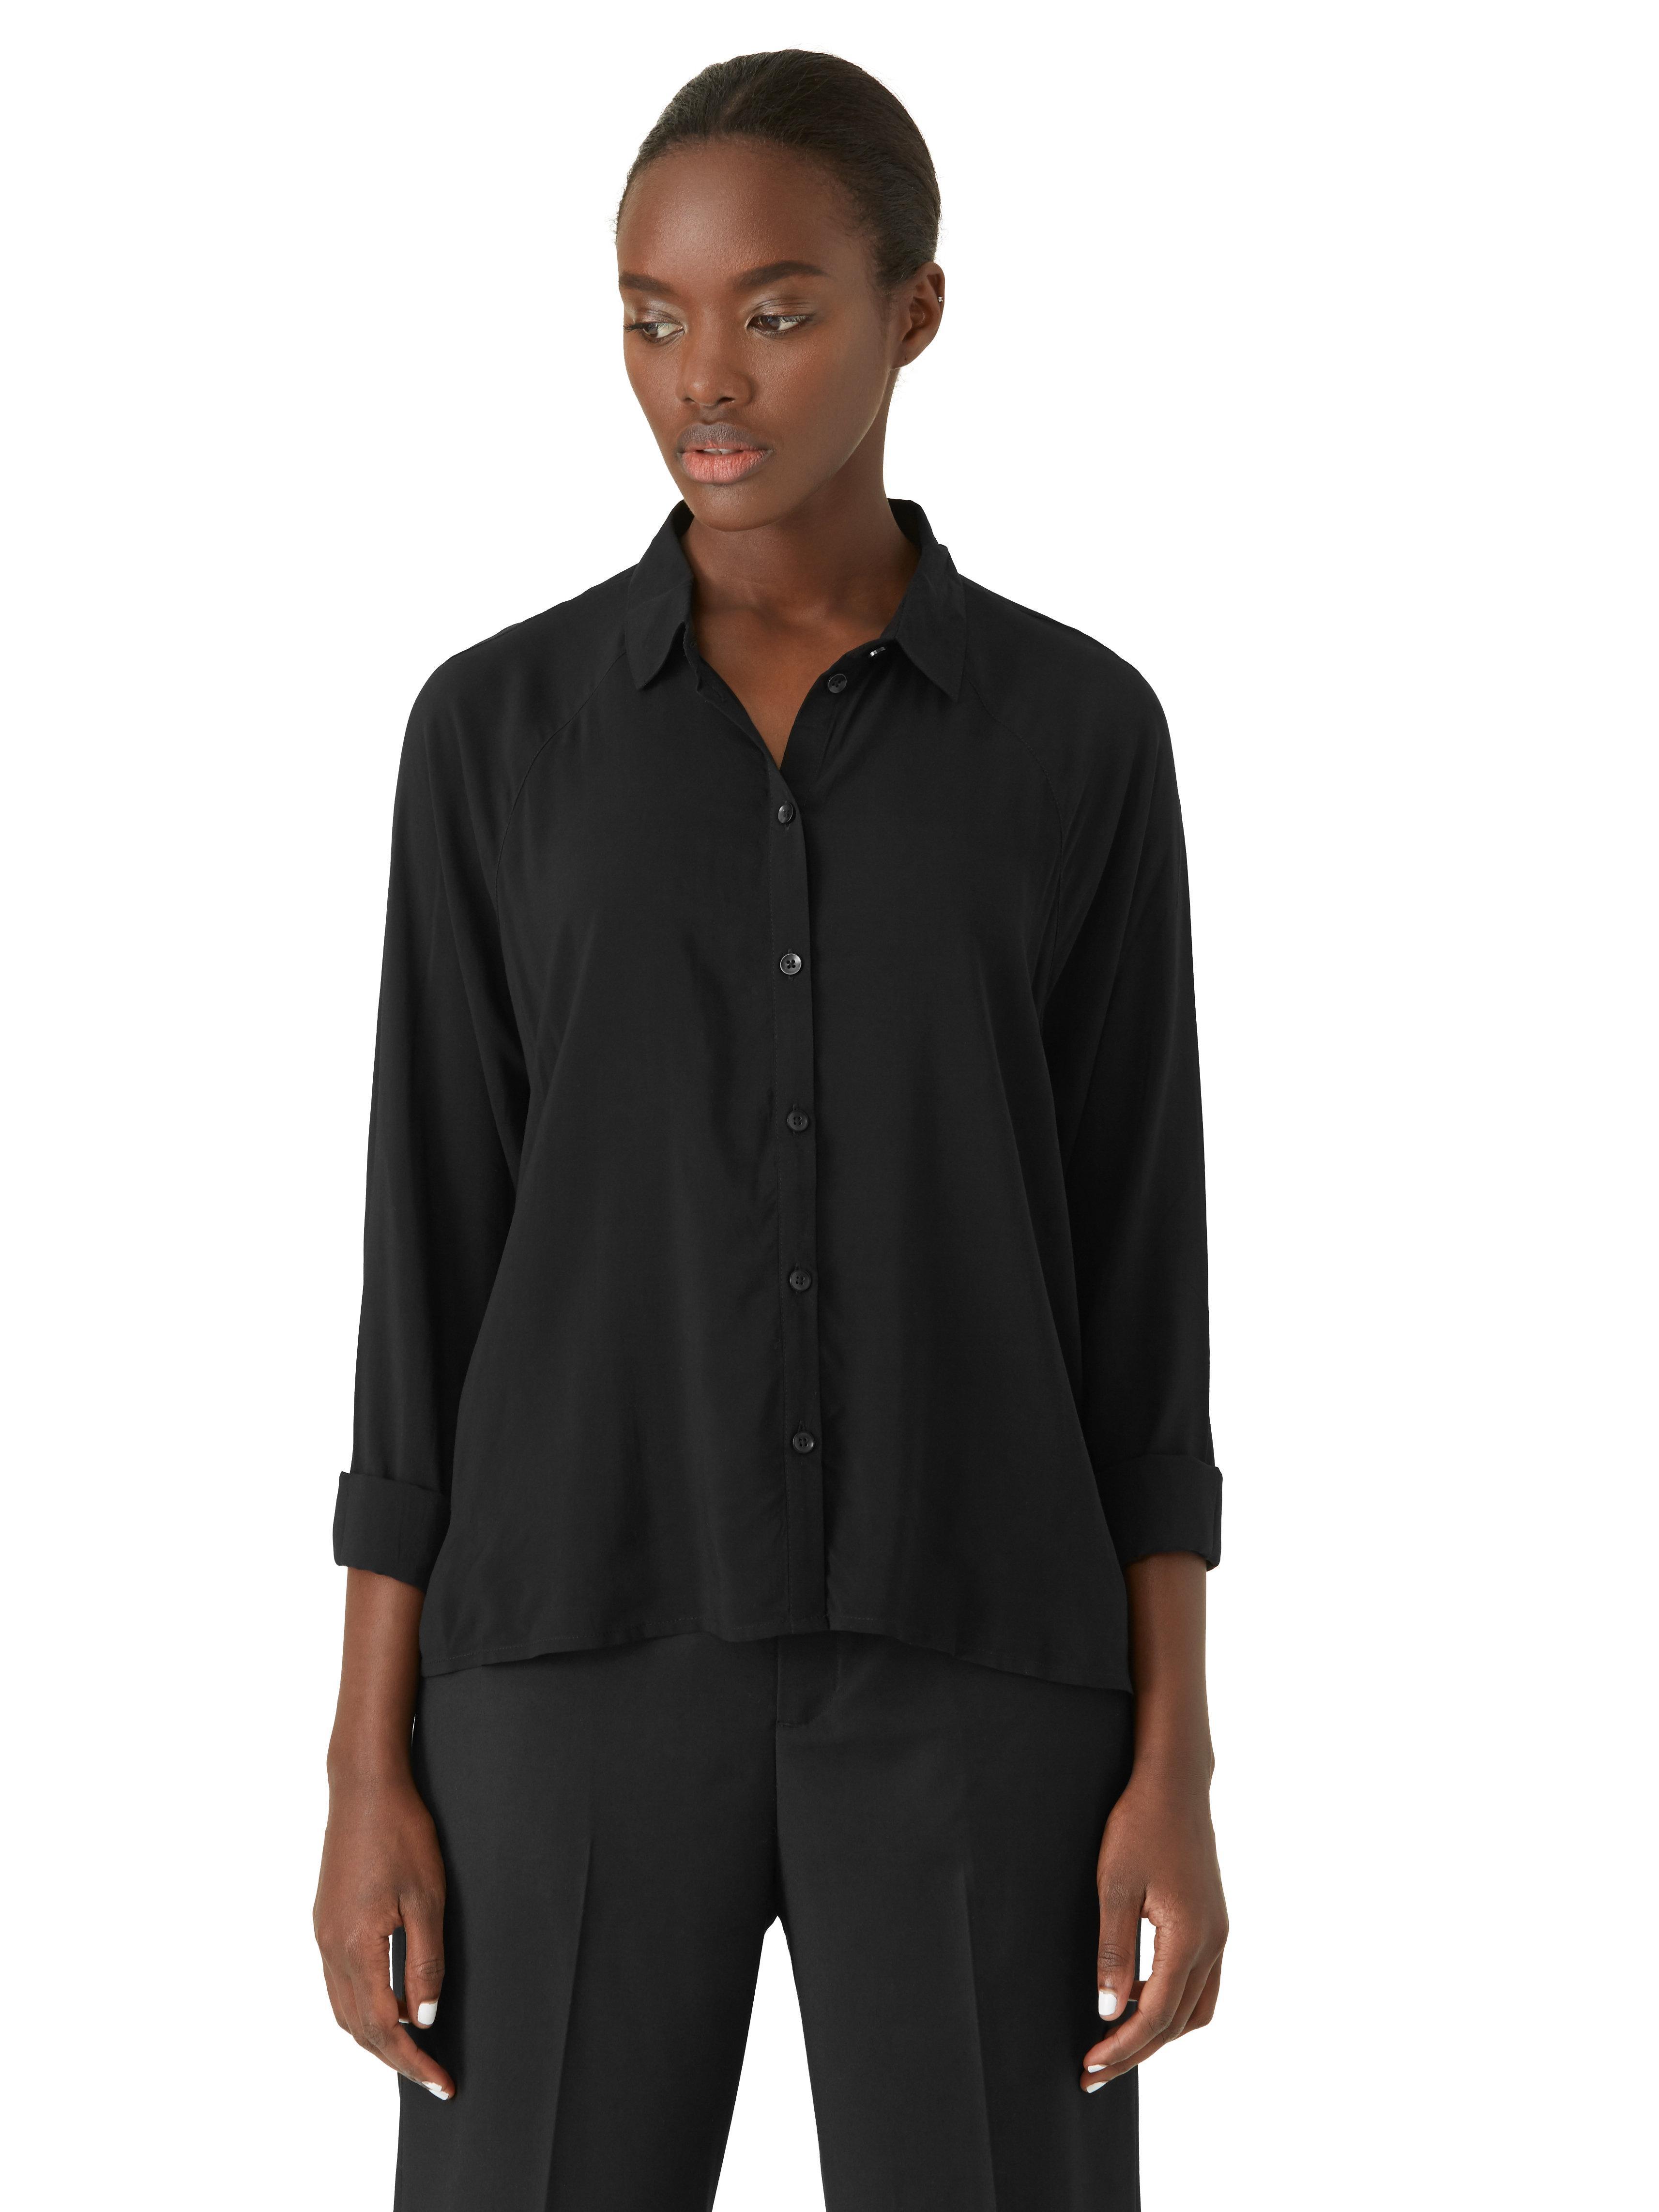 Frank oak fluid raglan shirt in black in black lyst for Frank and oak shirt